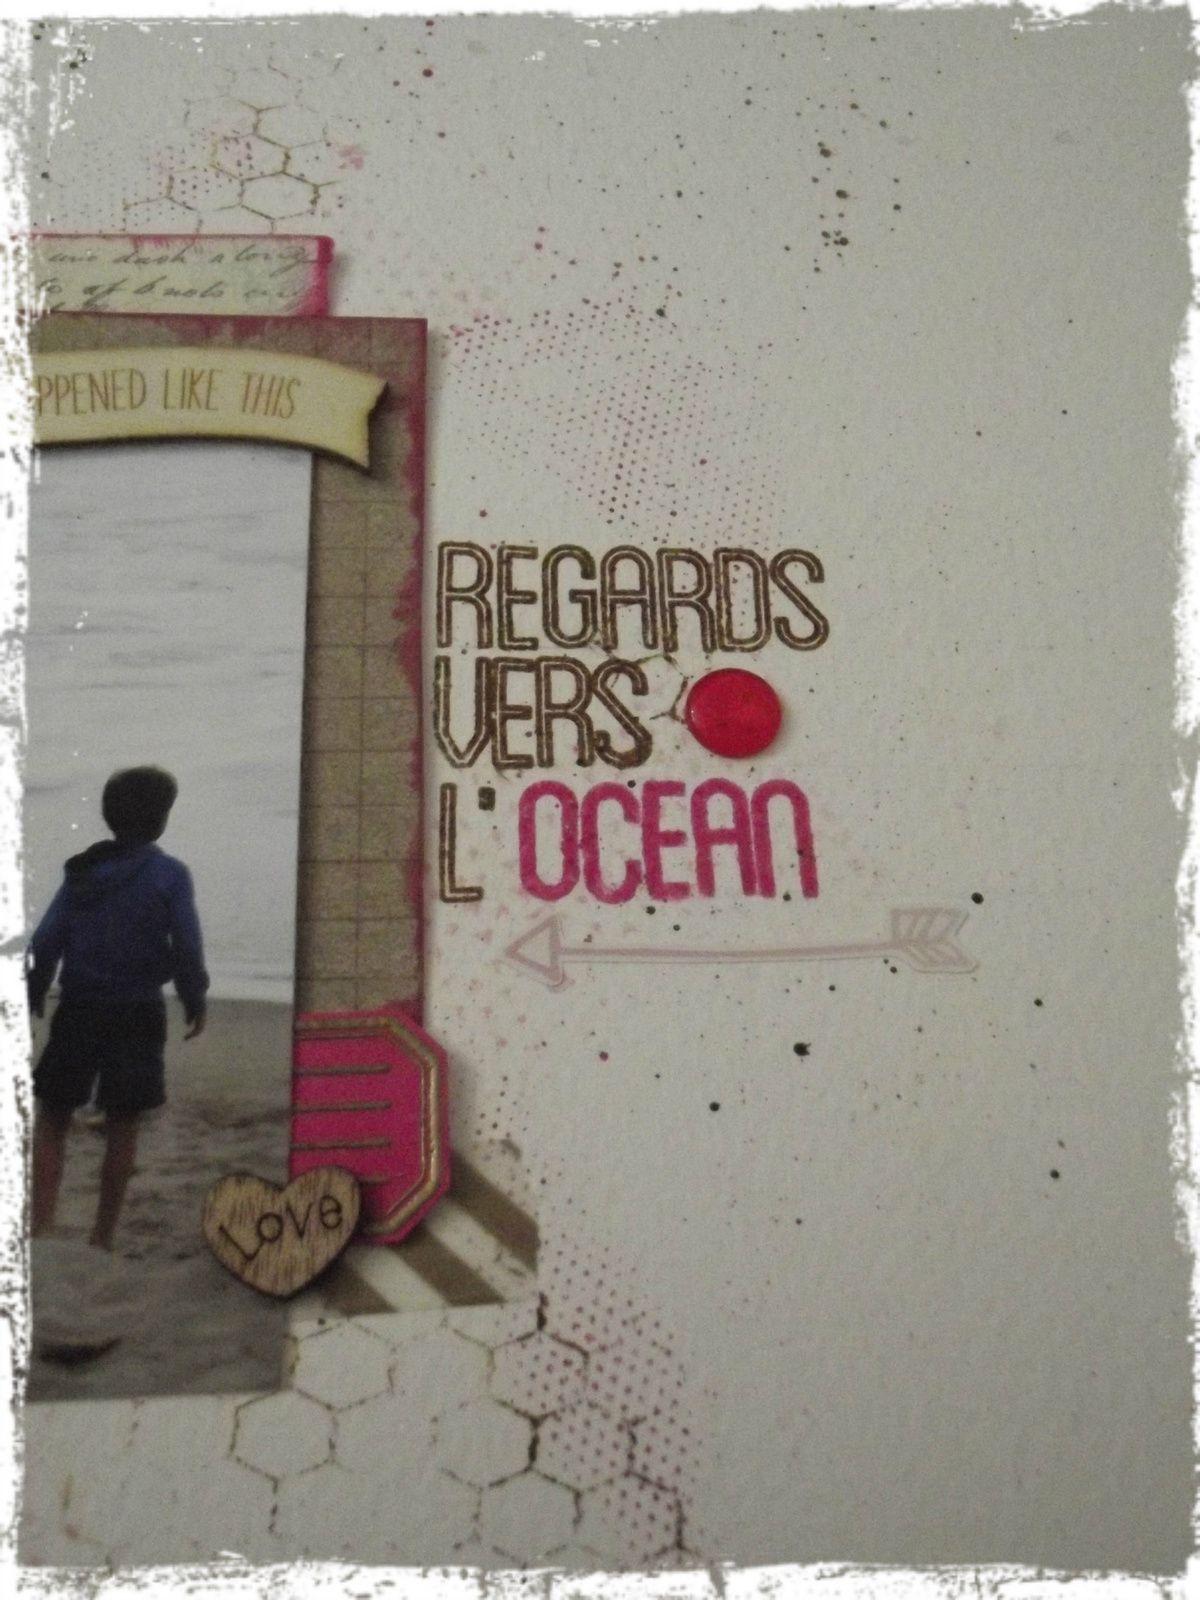 Regards vers l'océan !